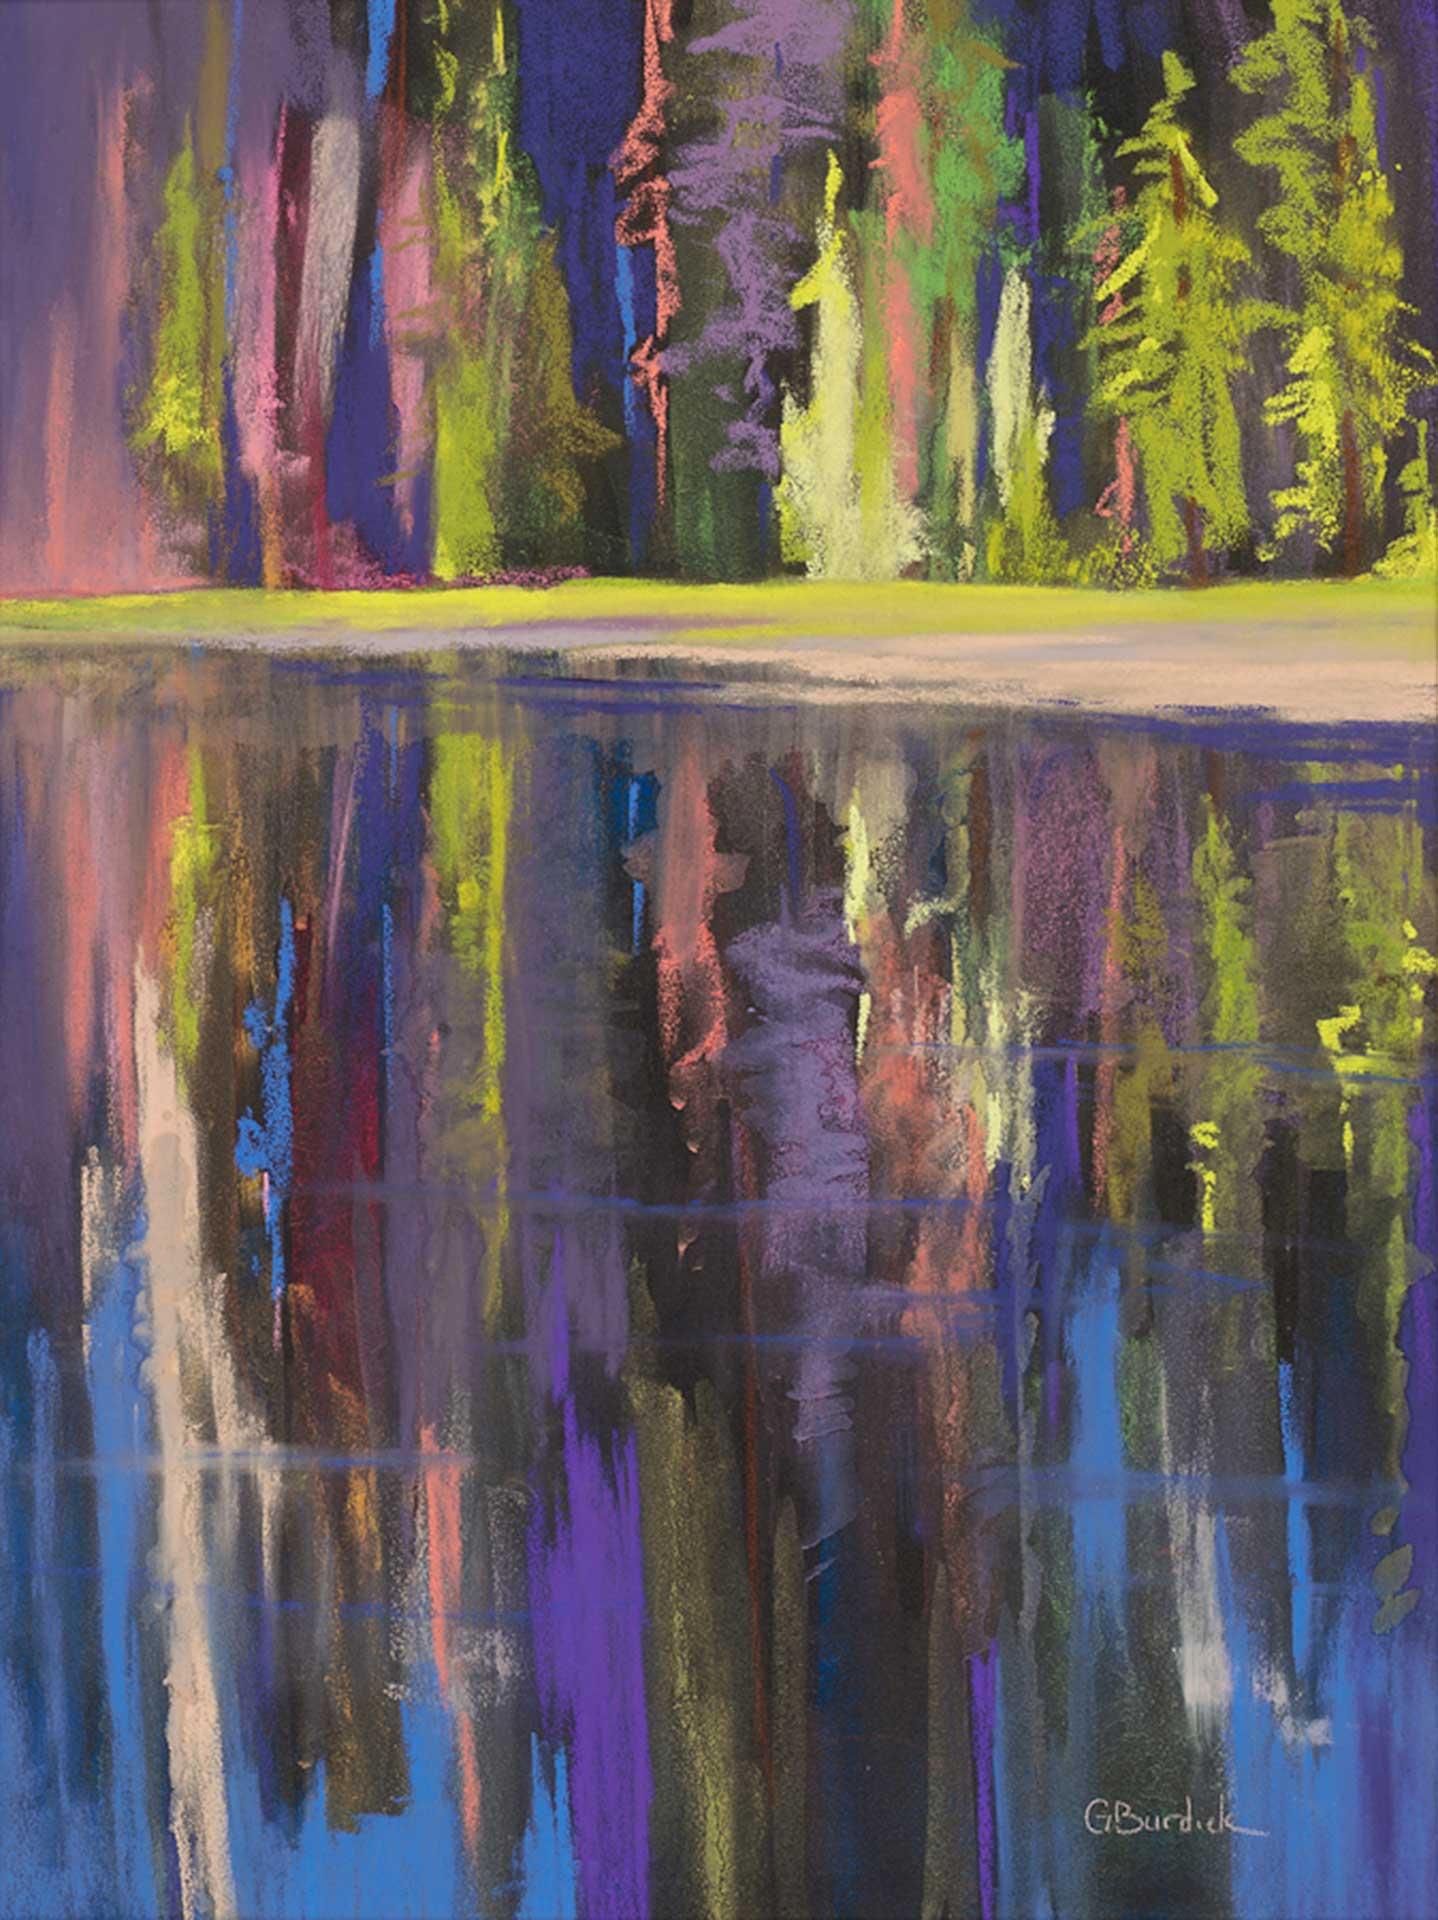 Burdick_meadow_underwater_yosemitefallsreflectionLR.jpg